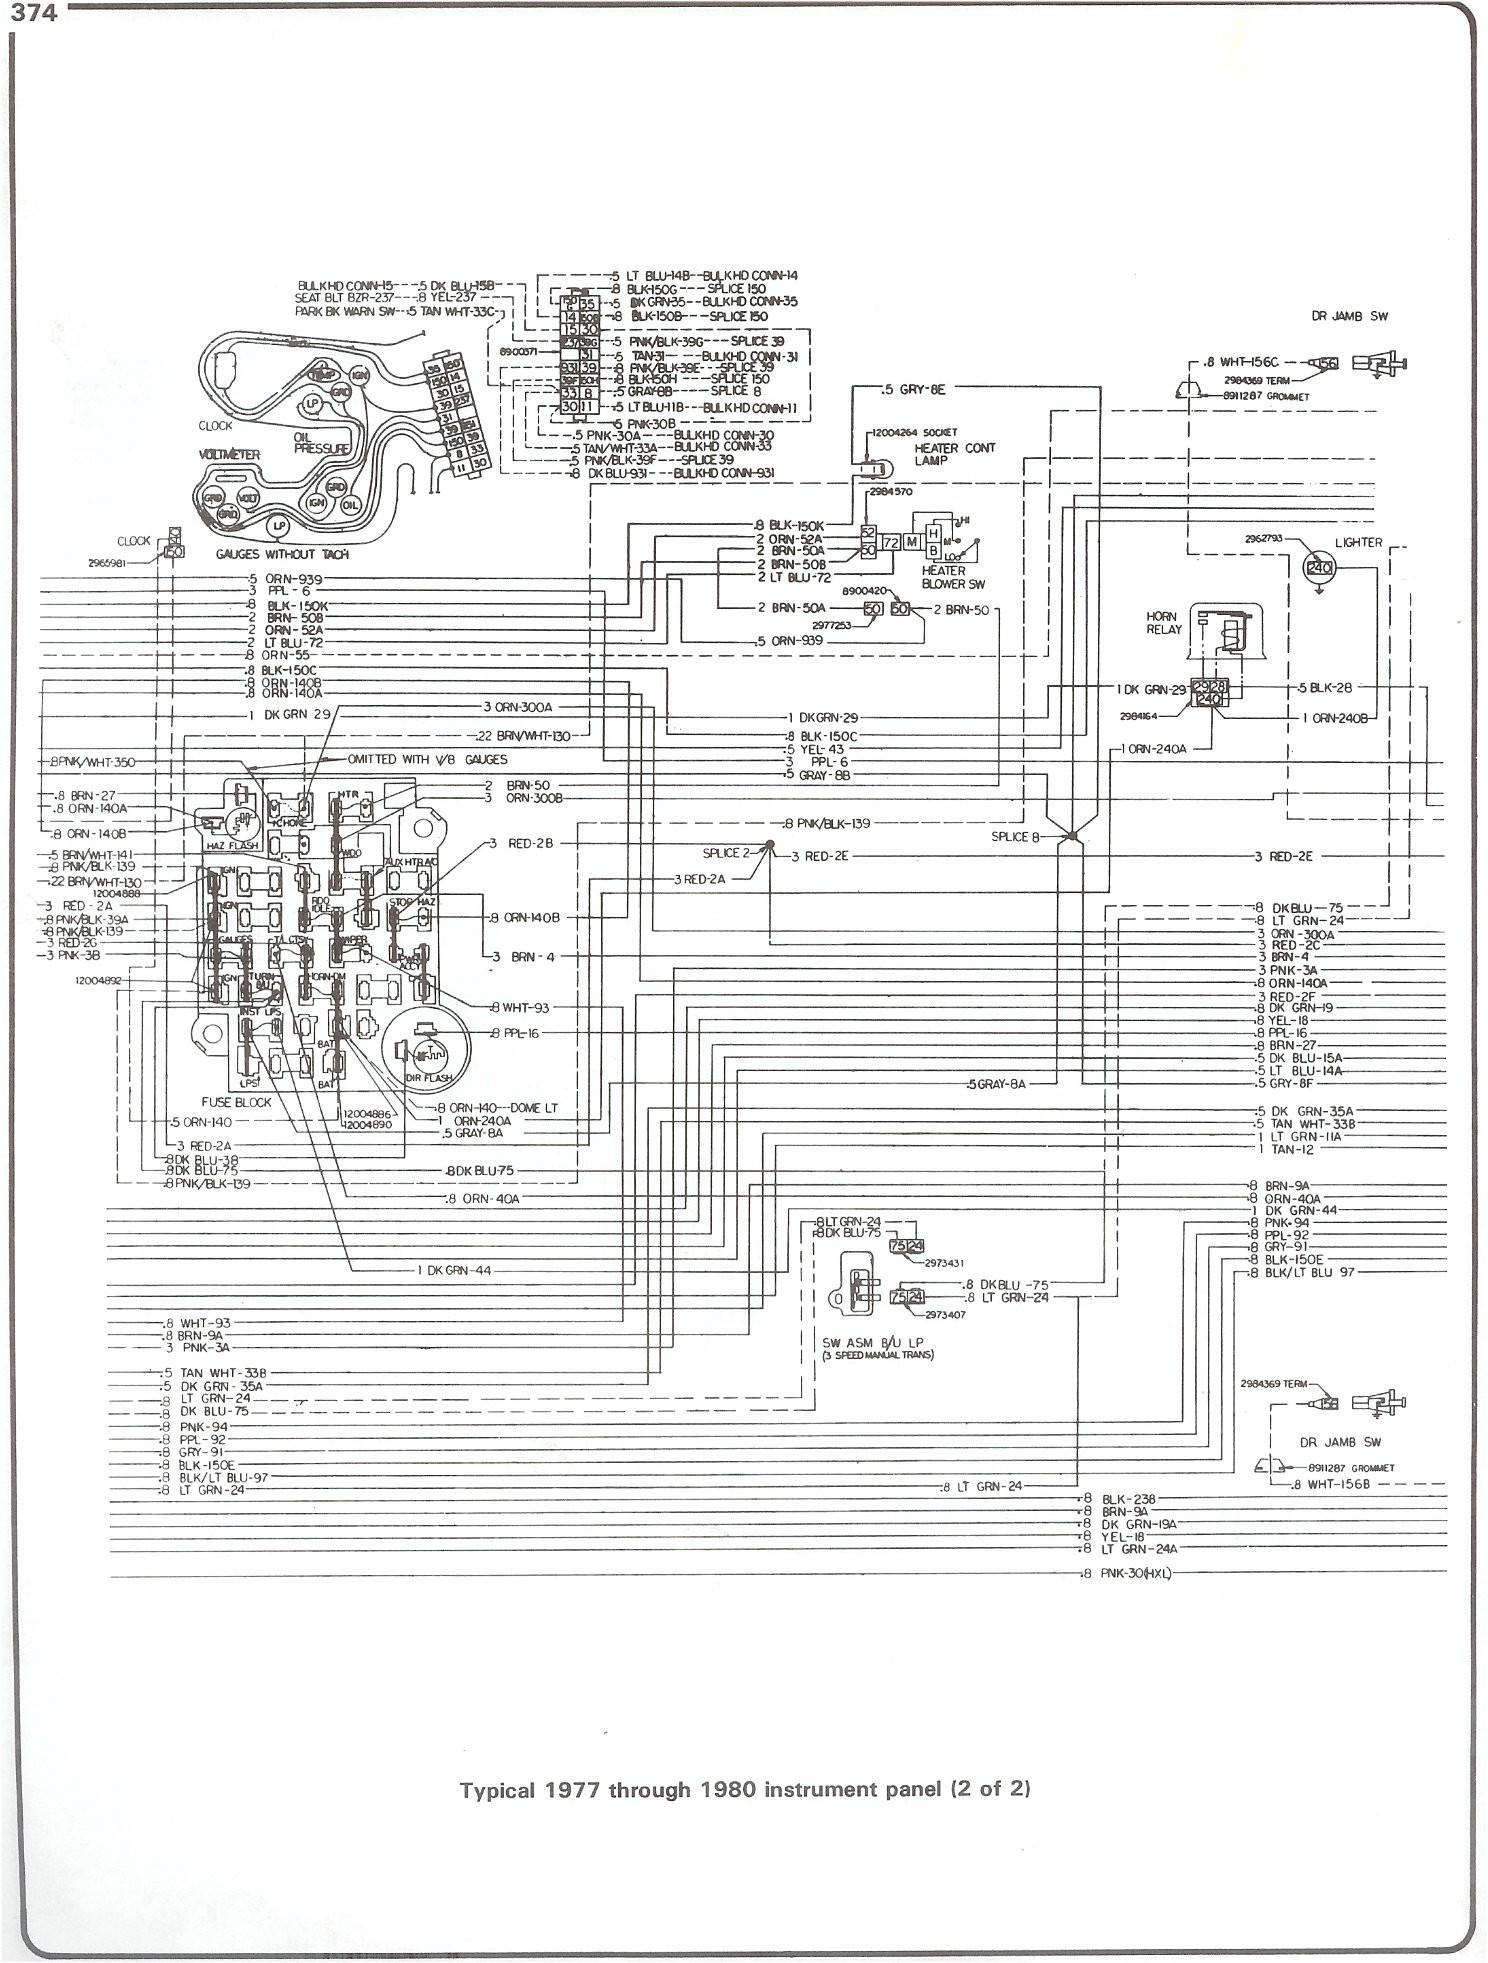 Box Truck Diagram 78 Chevy Starter Diagram Wiring Diagram Of Box Truck Diagram